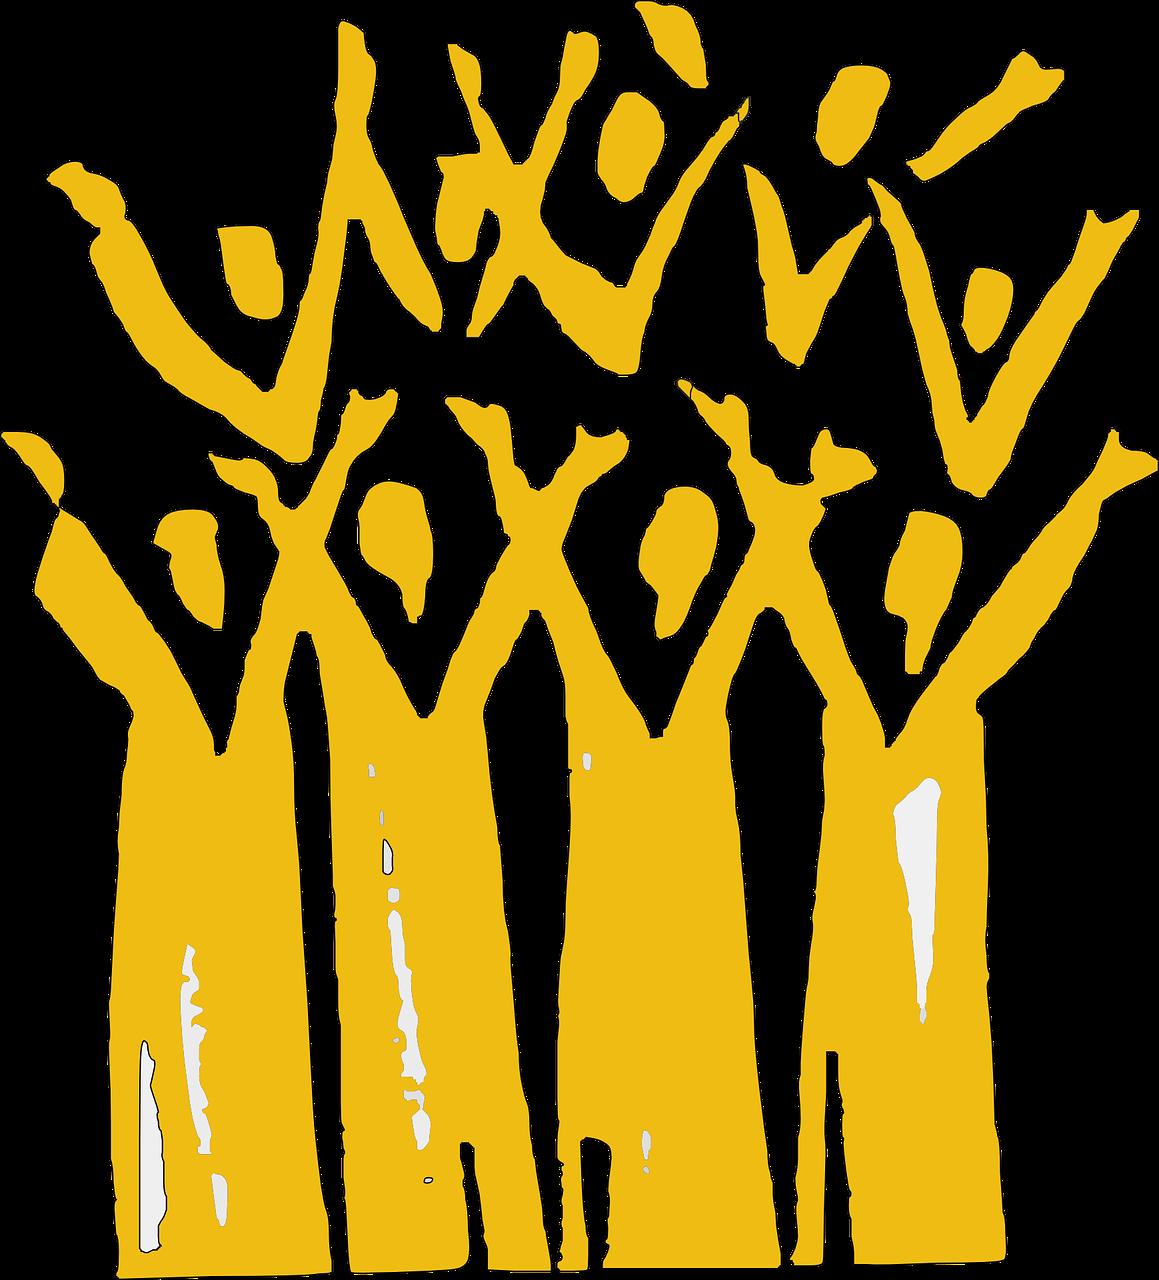 Choir,sing,alto,cappella,praise - free image from needpix.com